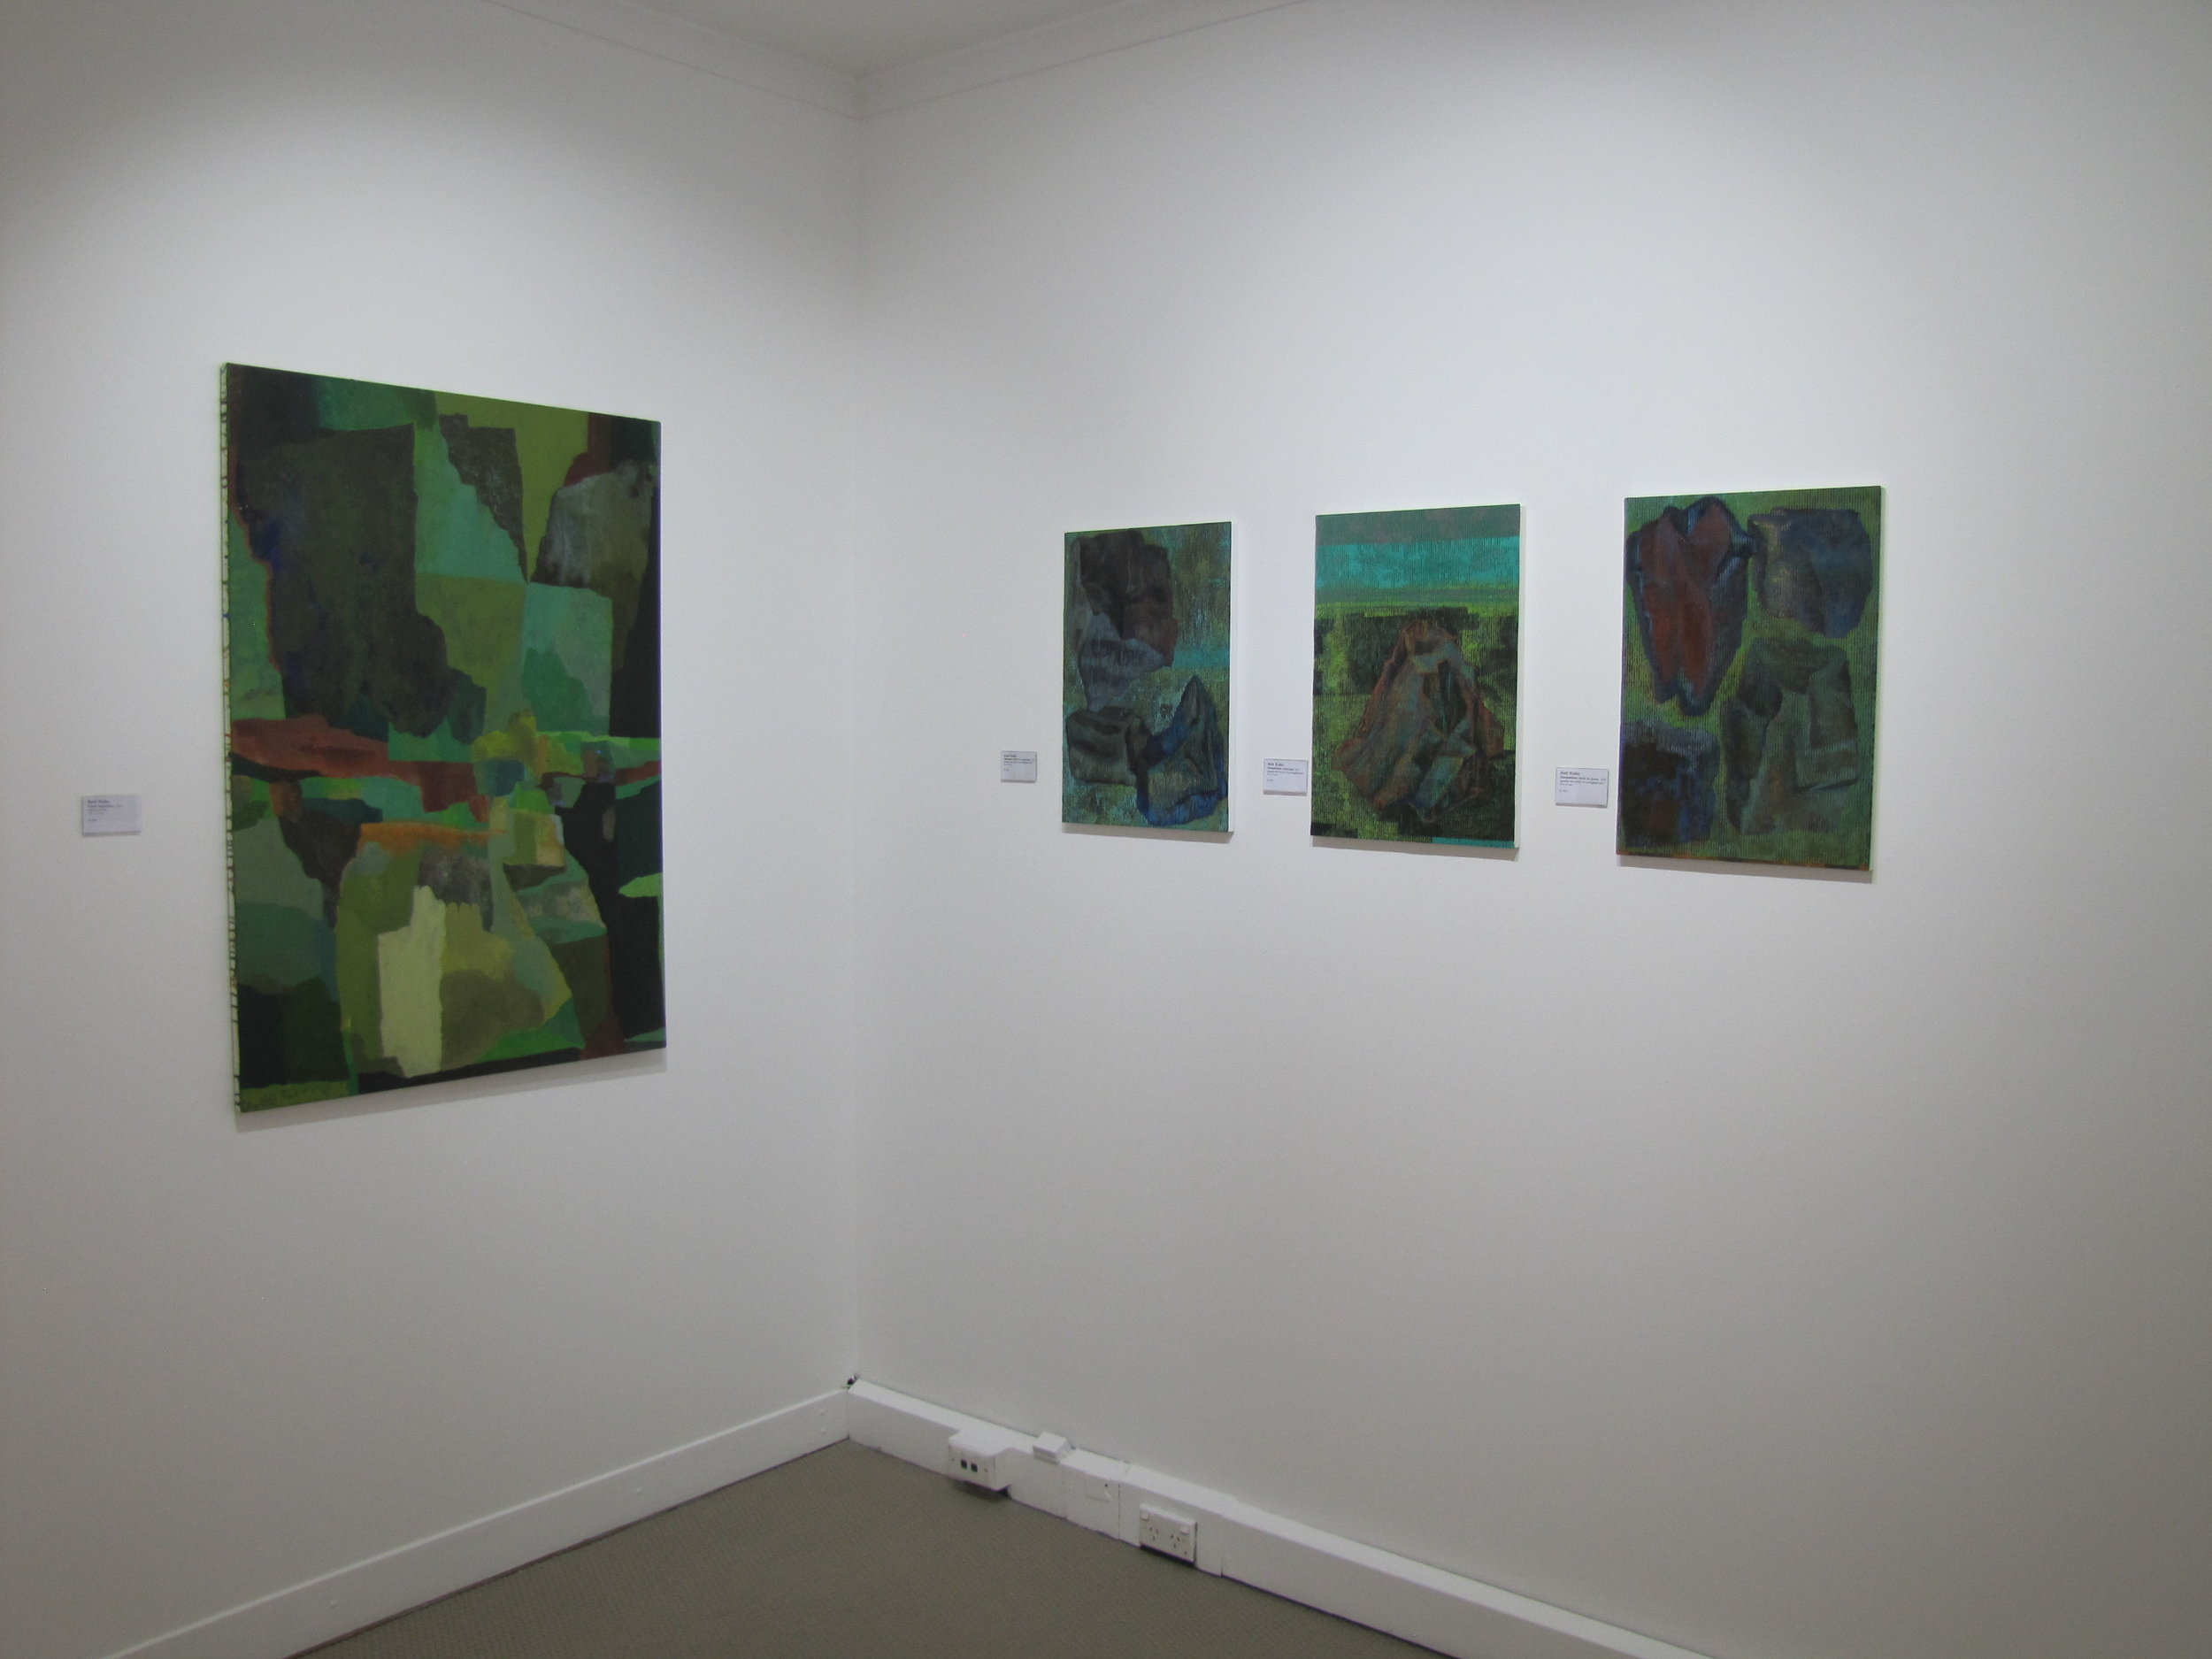 NSG. Waller 2 exhibition. Exhibition views 13.jpg